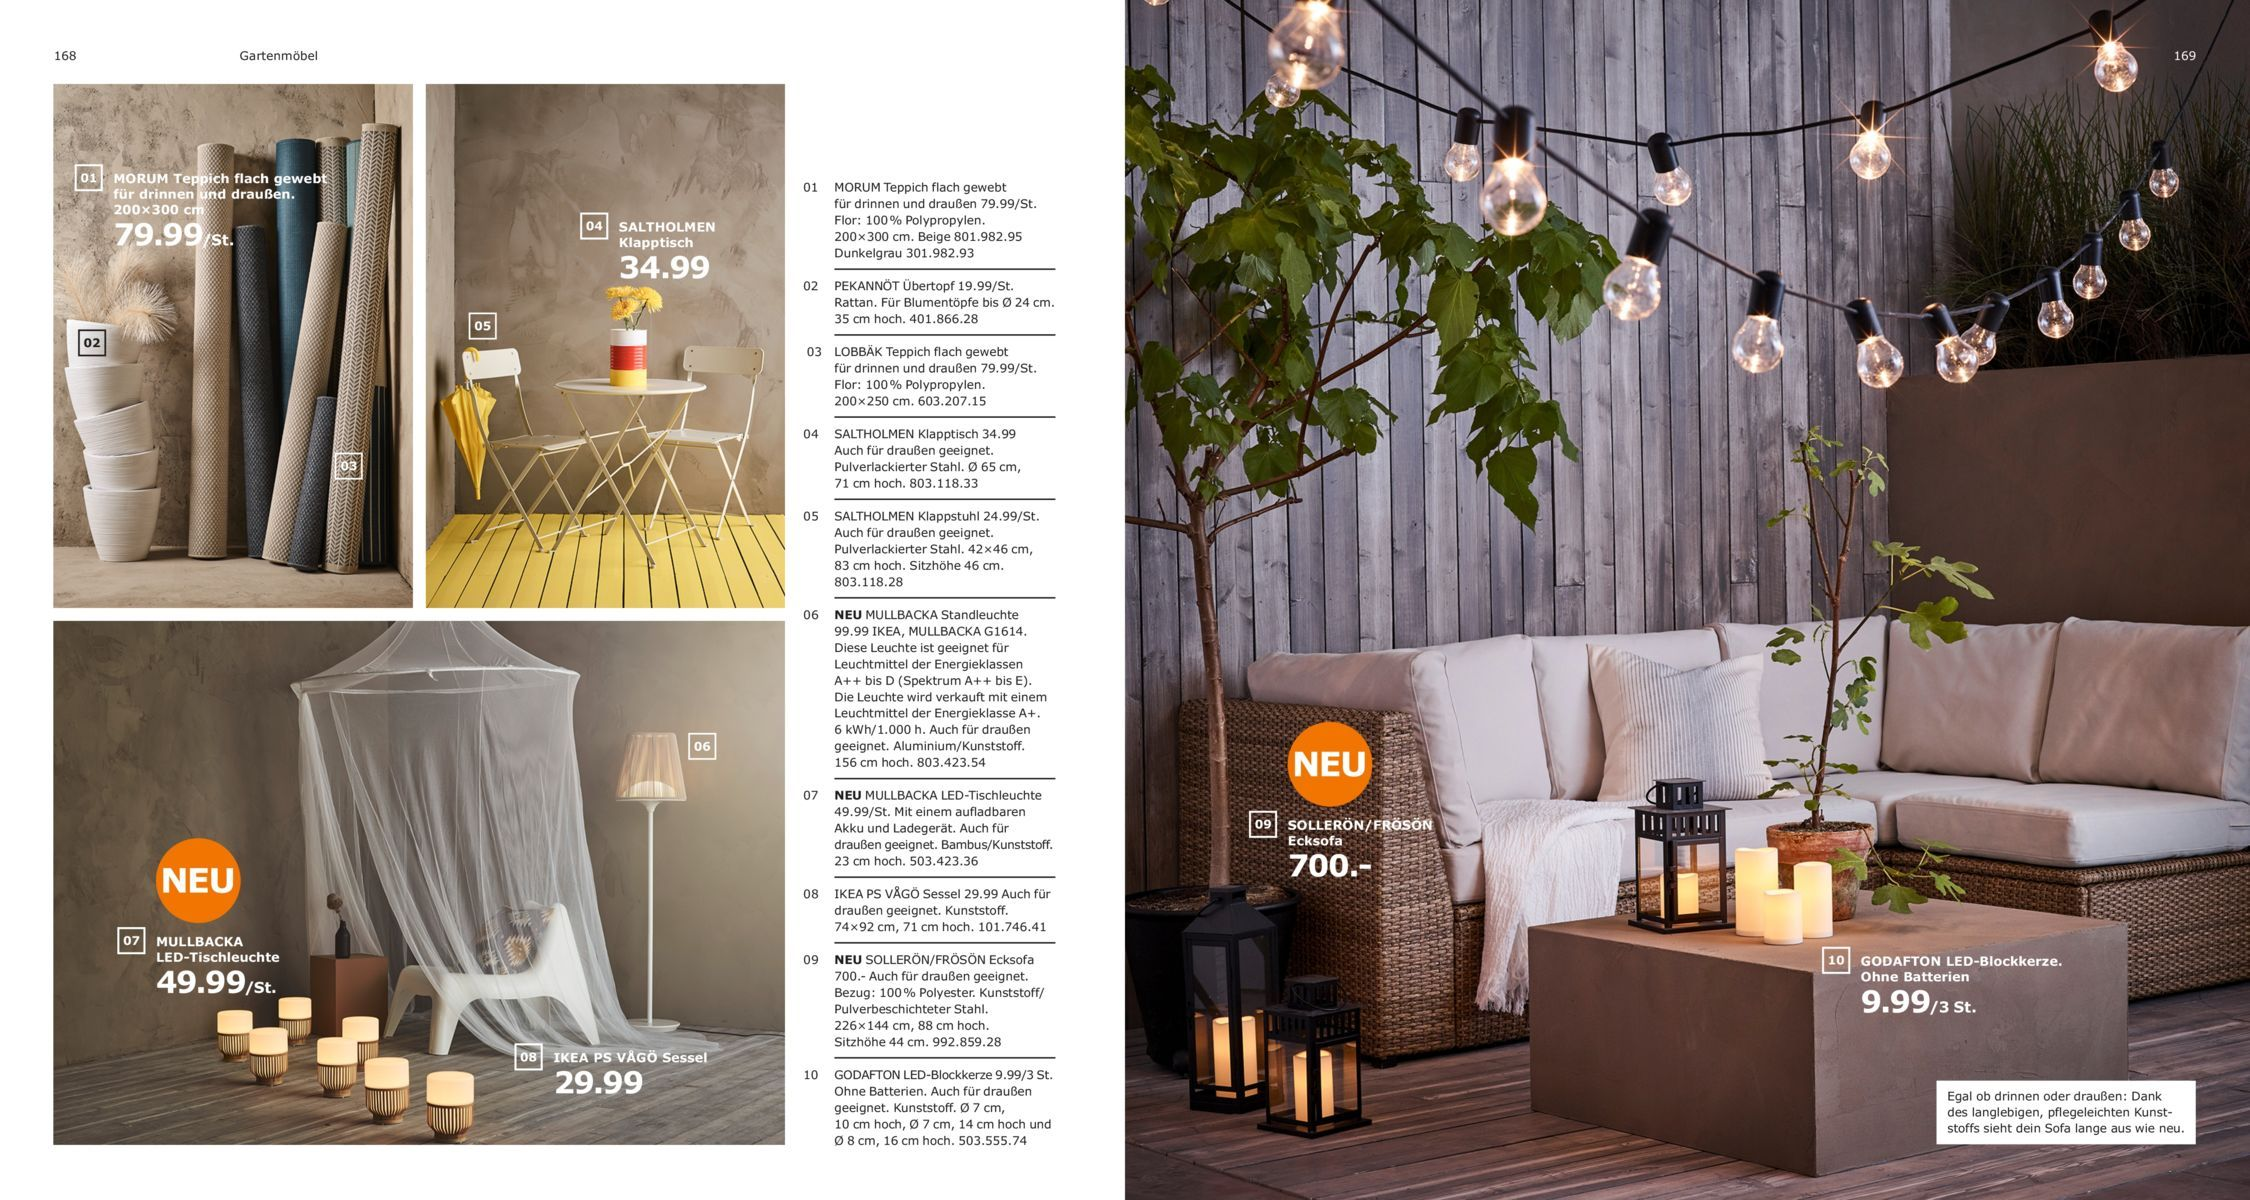 Küche - IKEA Katalog 2019 | Draussenzimmer in 2019 | Ikea ...